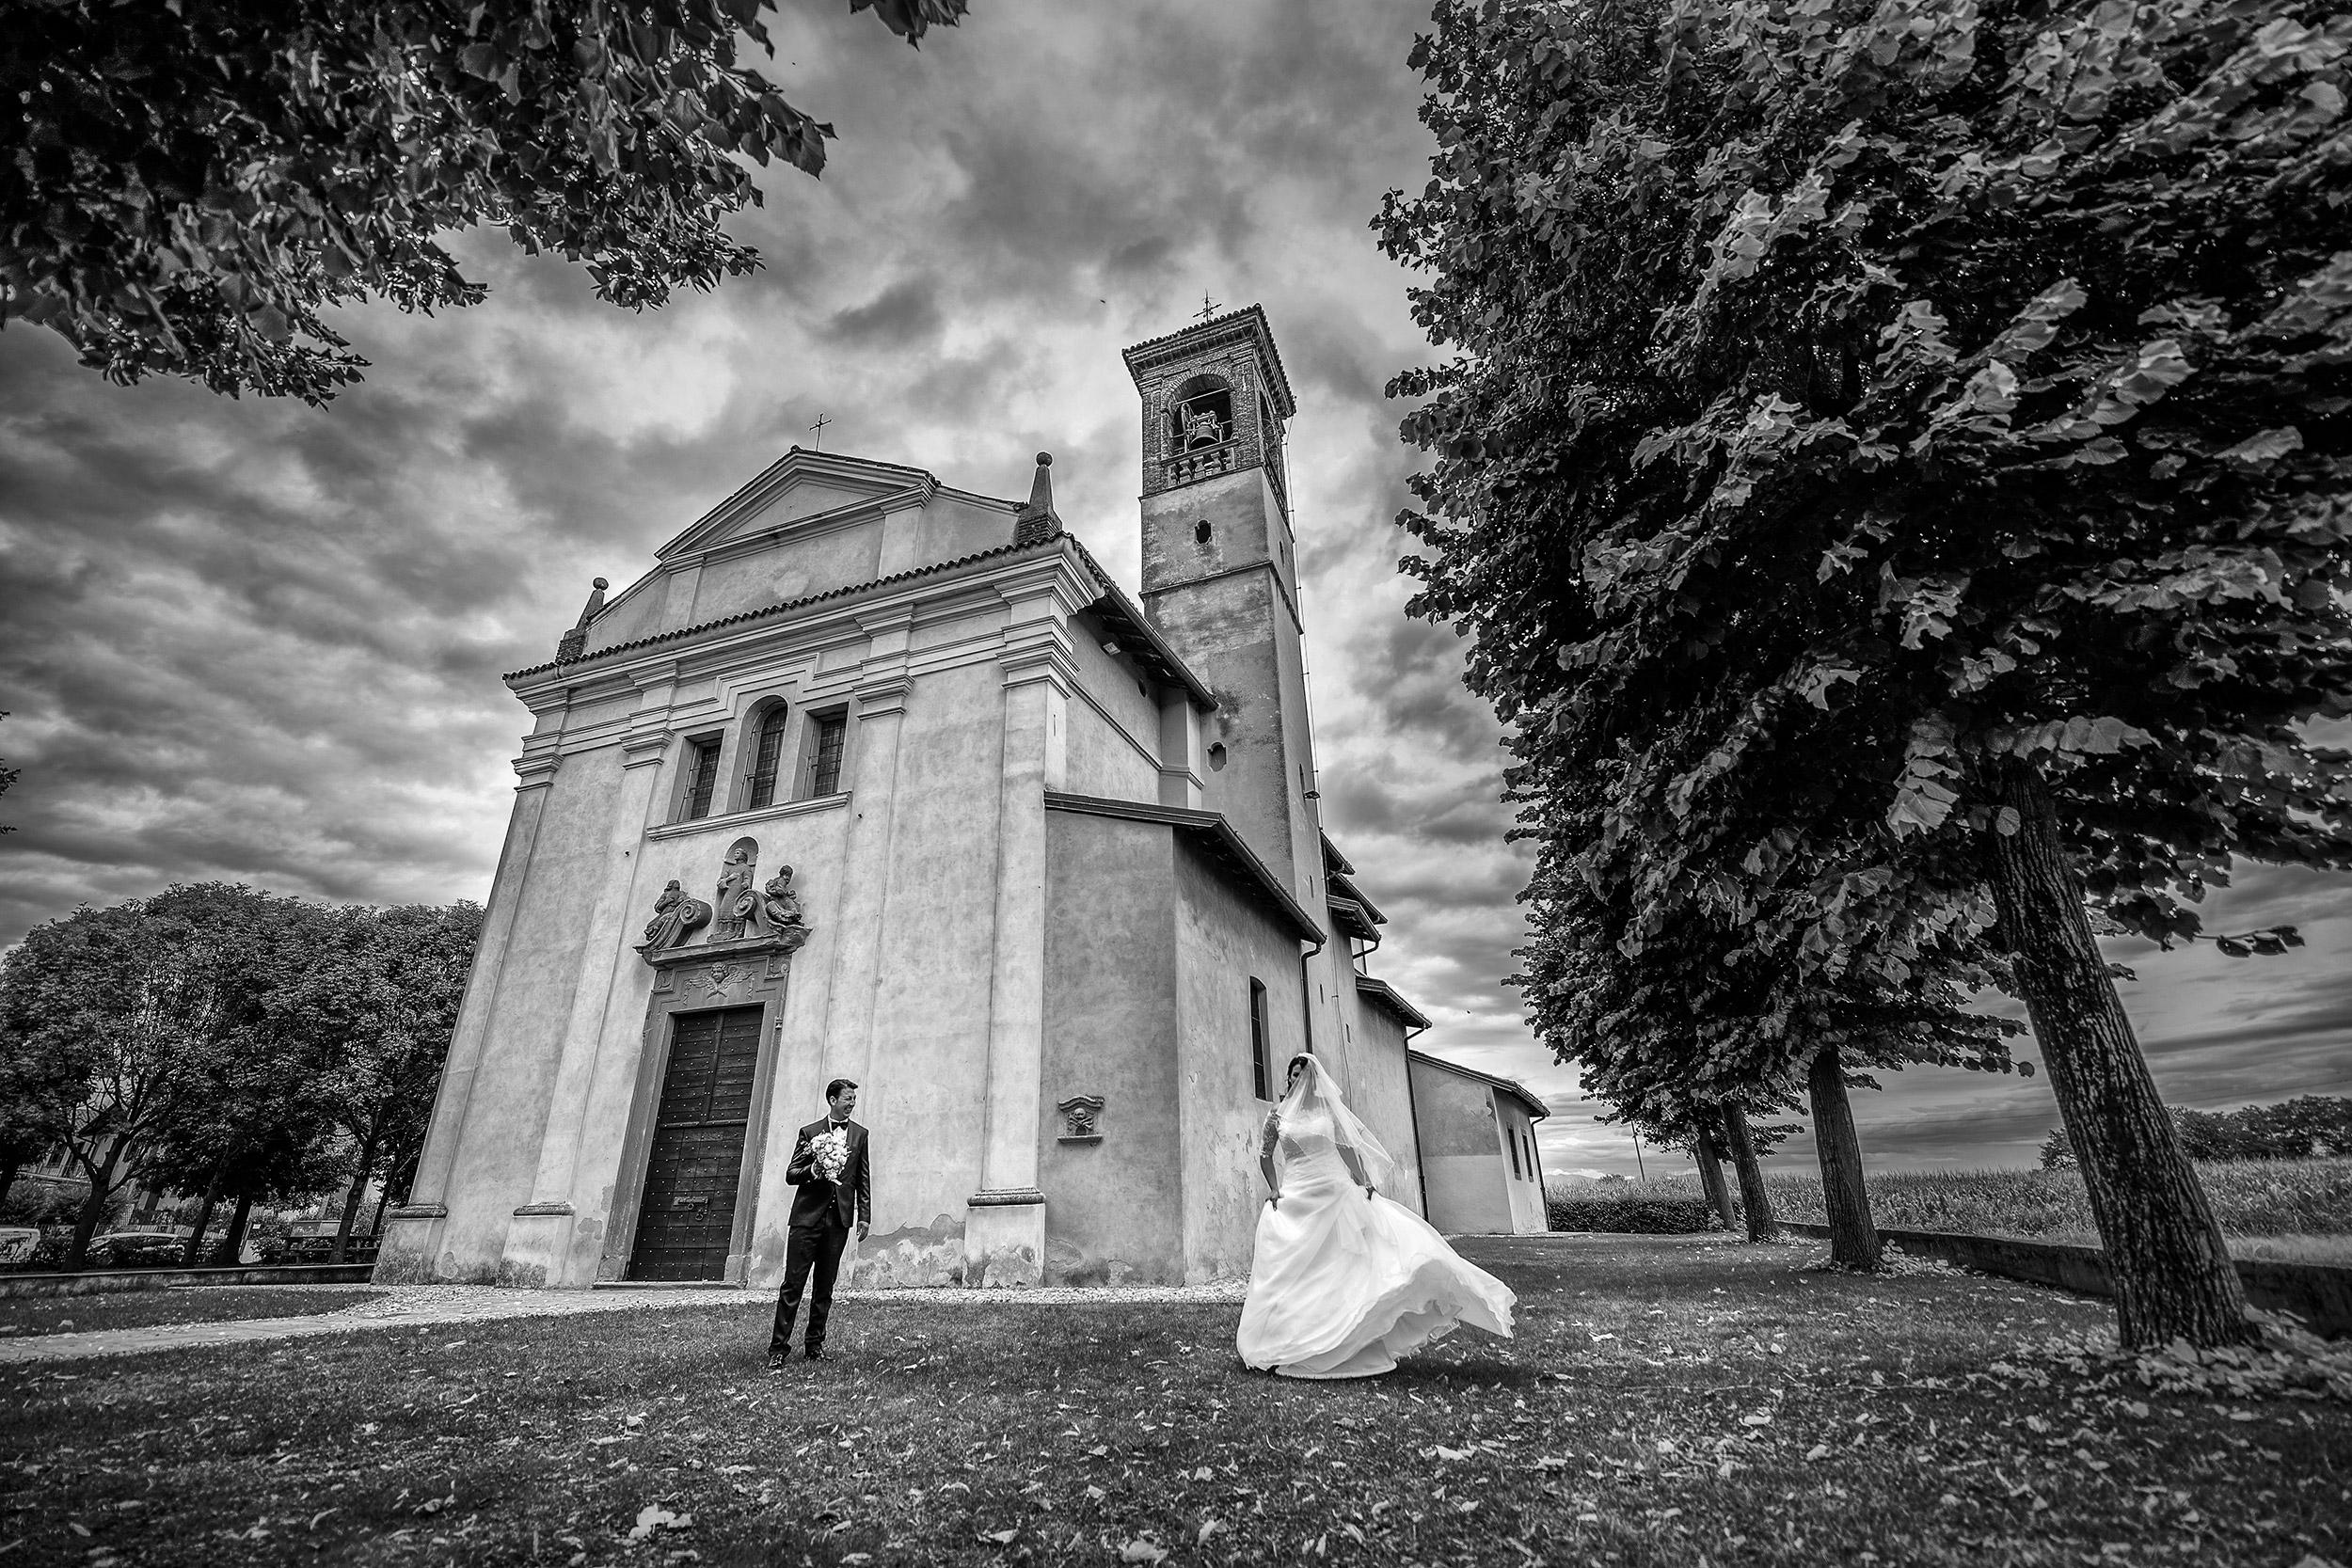 000 reportage sposi cerimonia foto uscita chiesa san lorenzo matrimonio wedding suisio bergamo copia 1